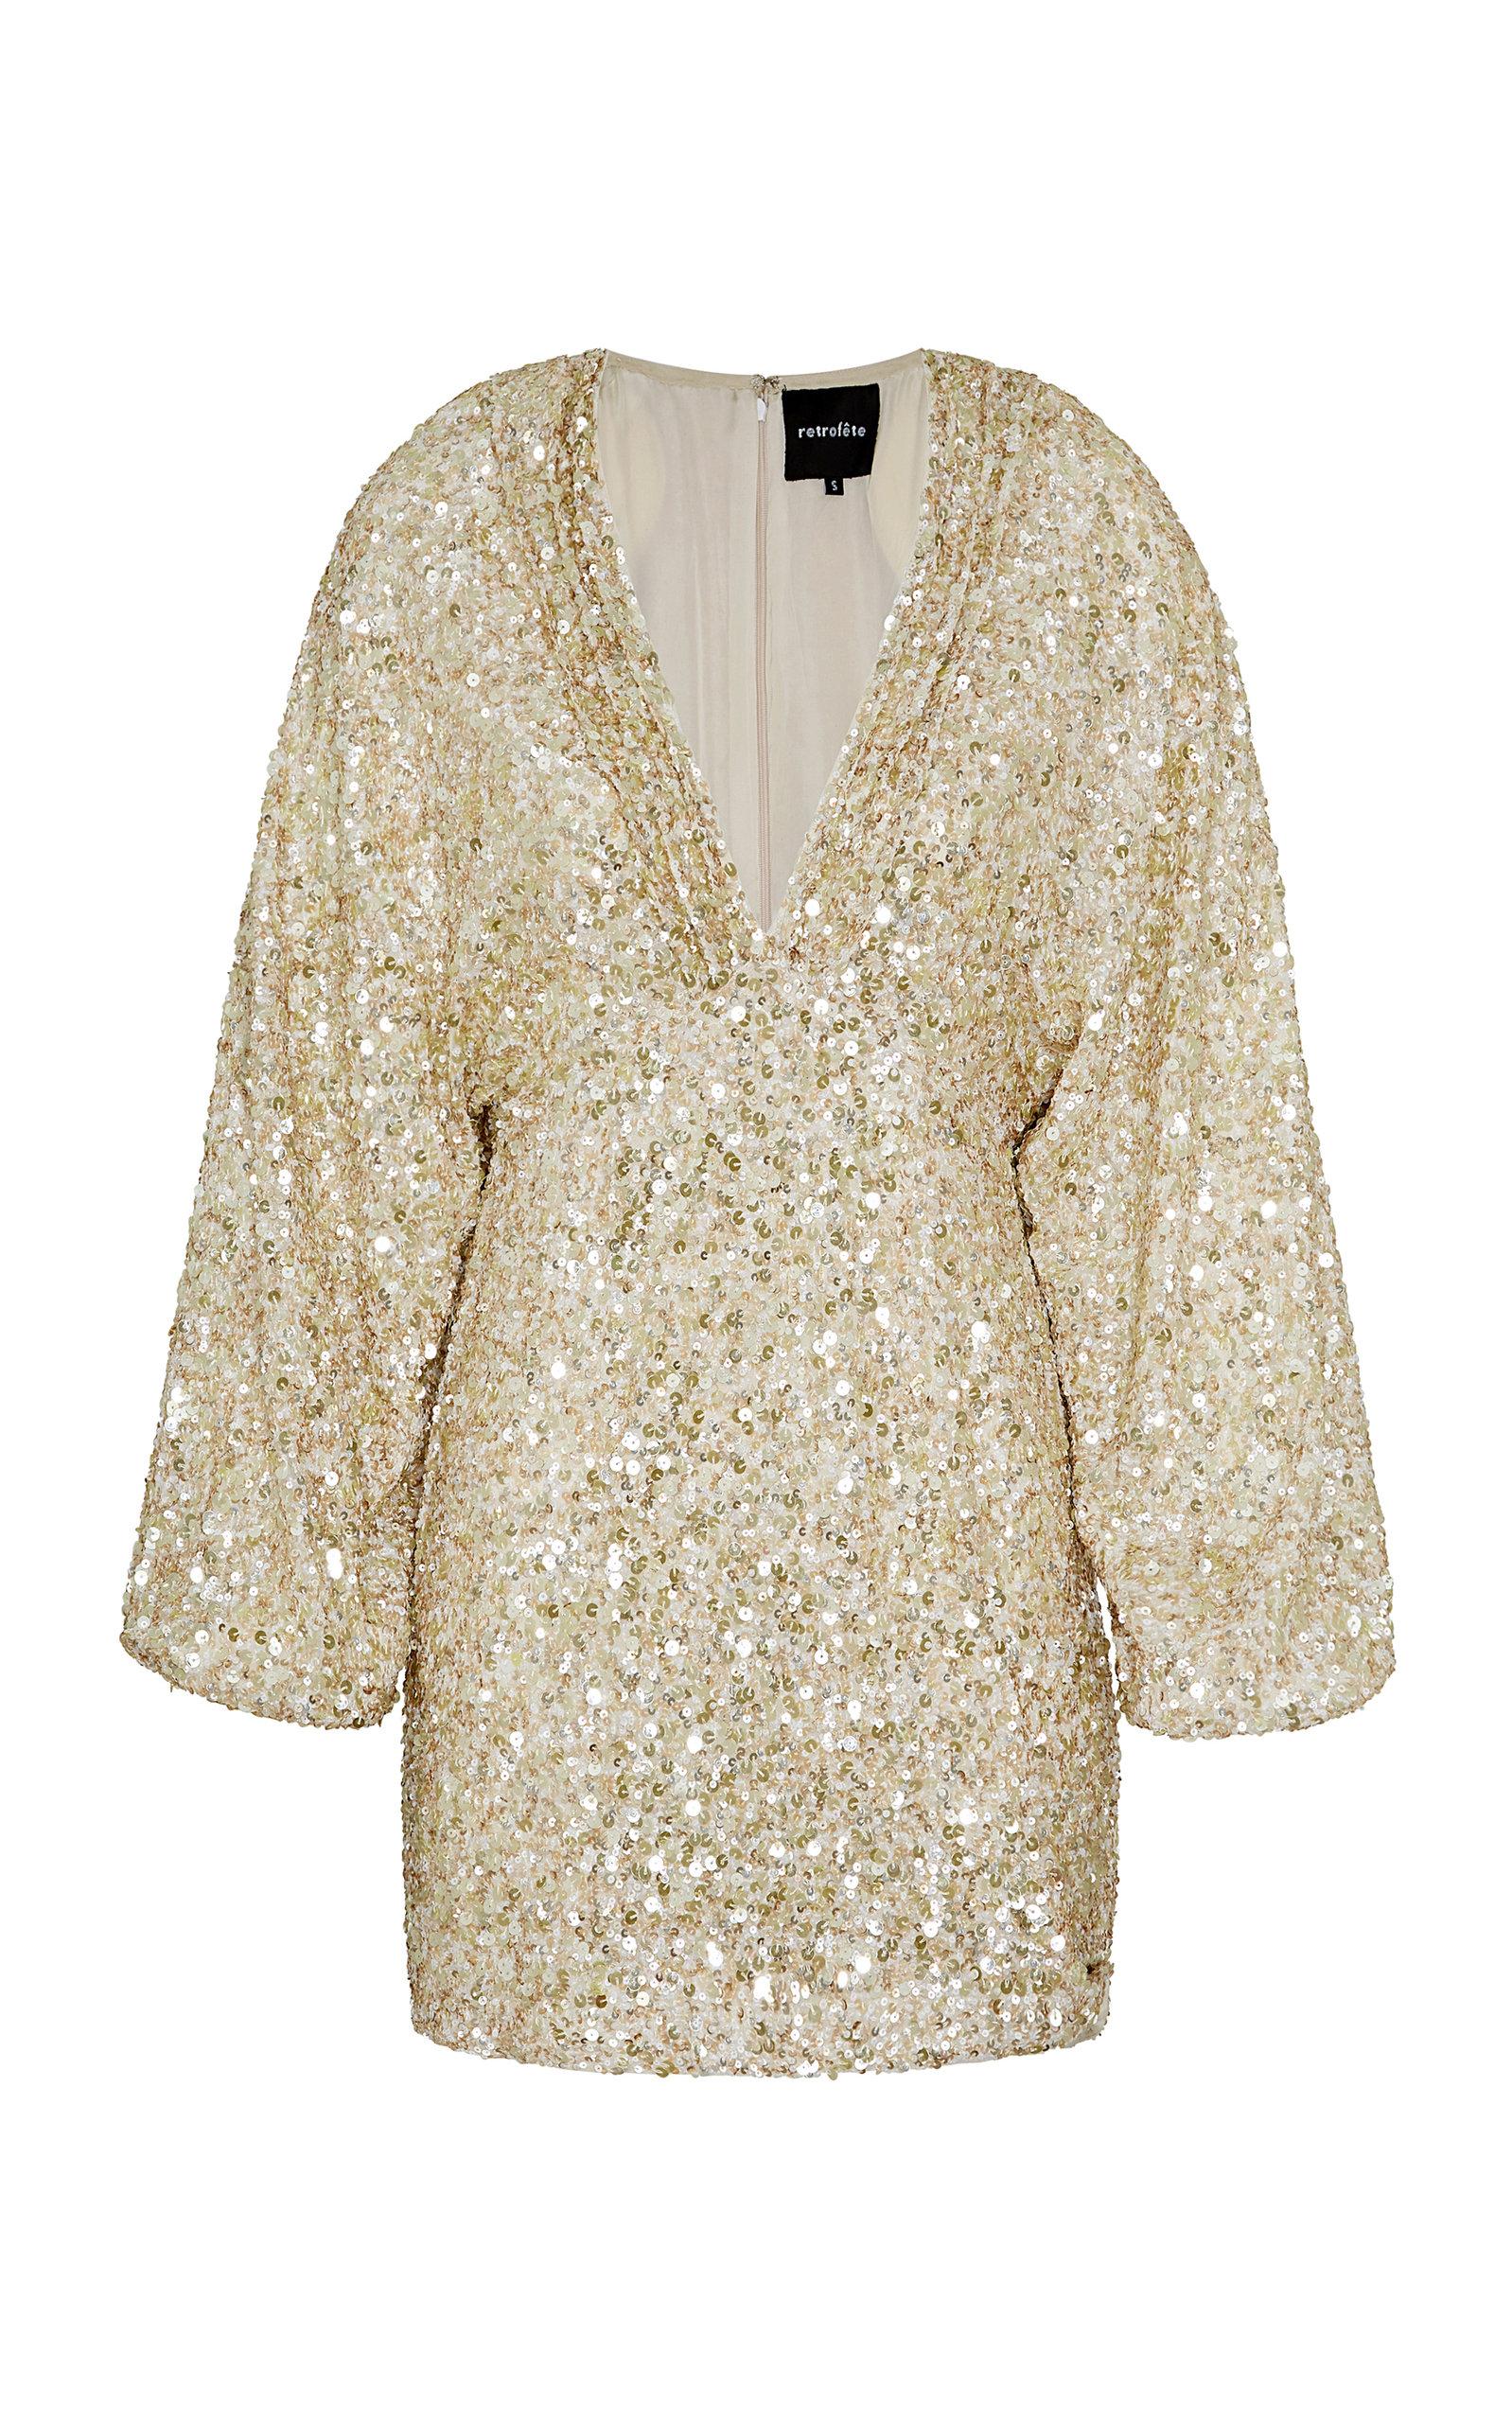 Buy Retrofête Aubrielle Sequin-Embellished Mini Dress online, shop Retrofête at the best price